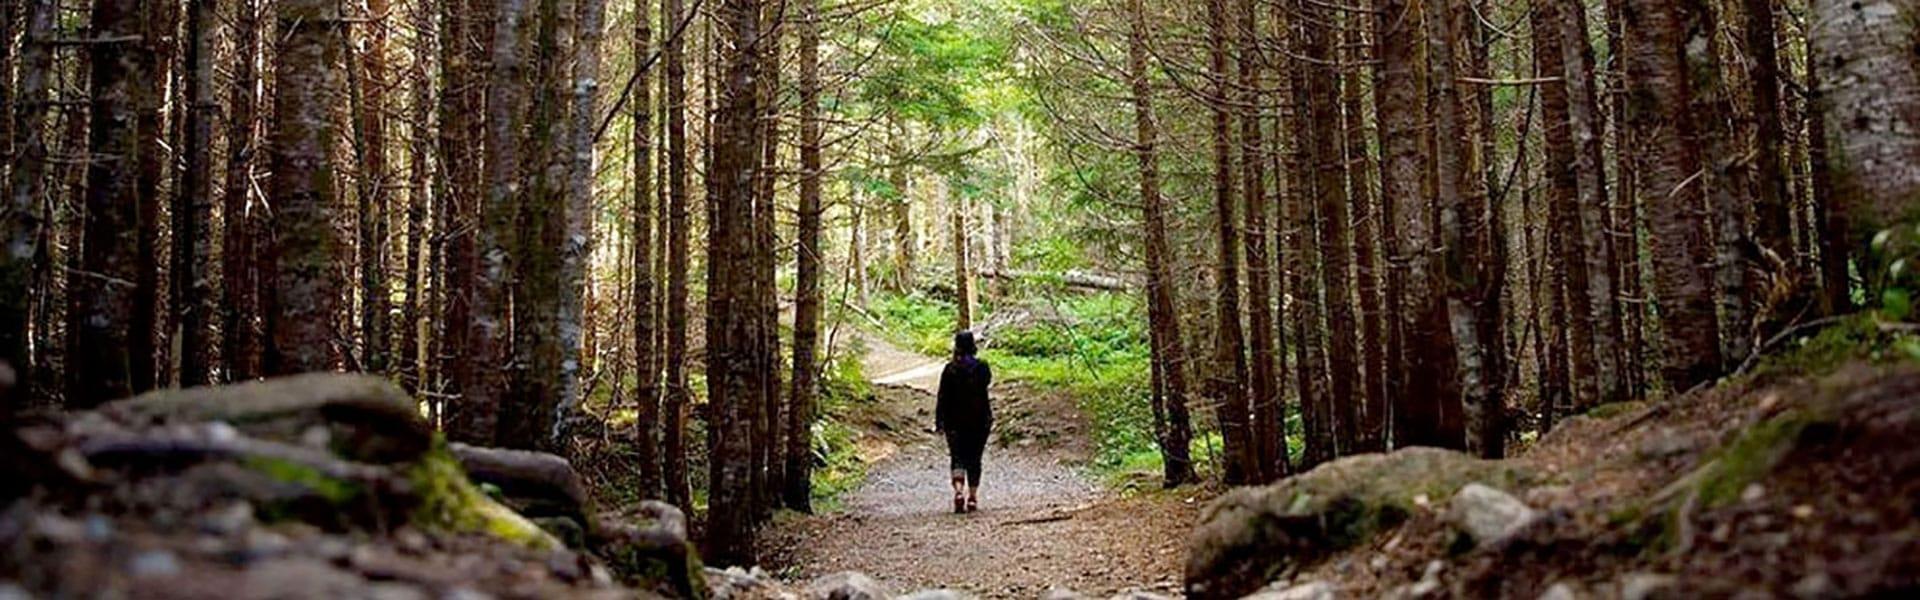 A woman walks down a trail in a dense forest